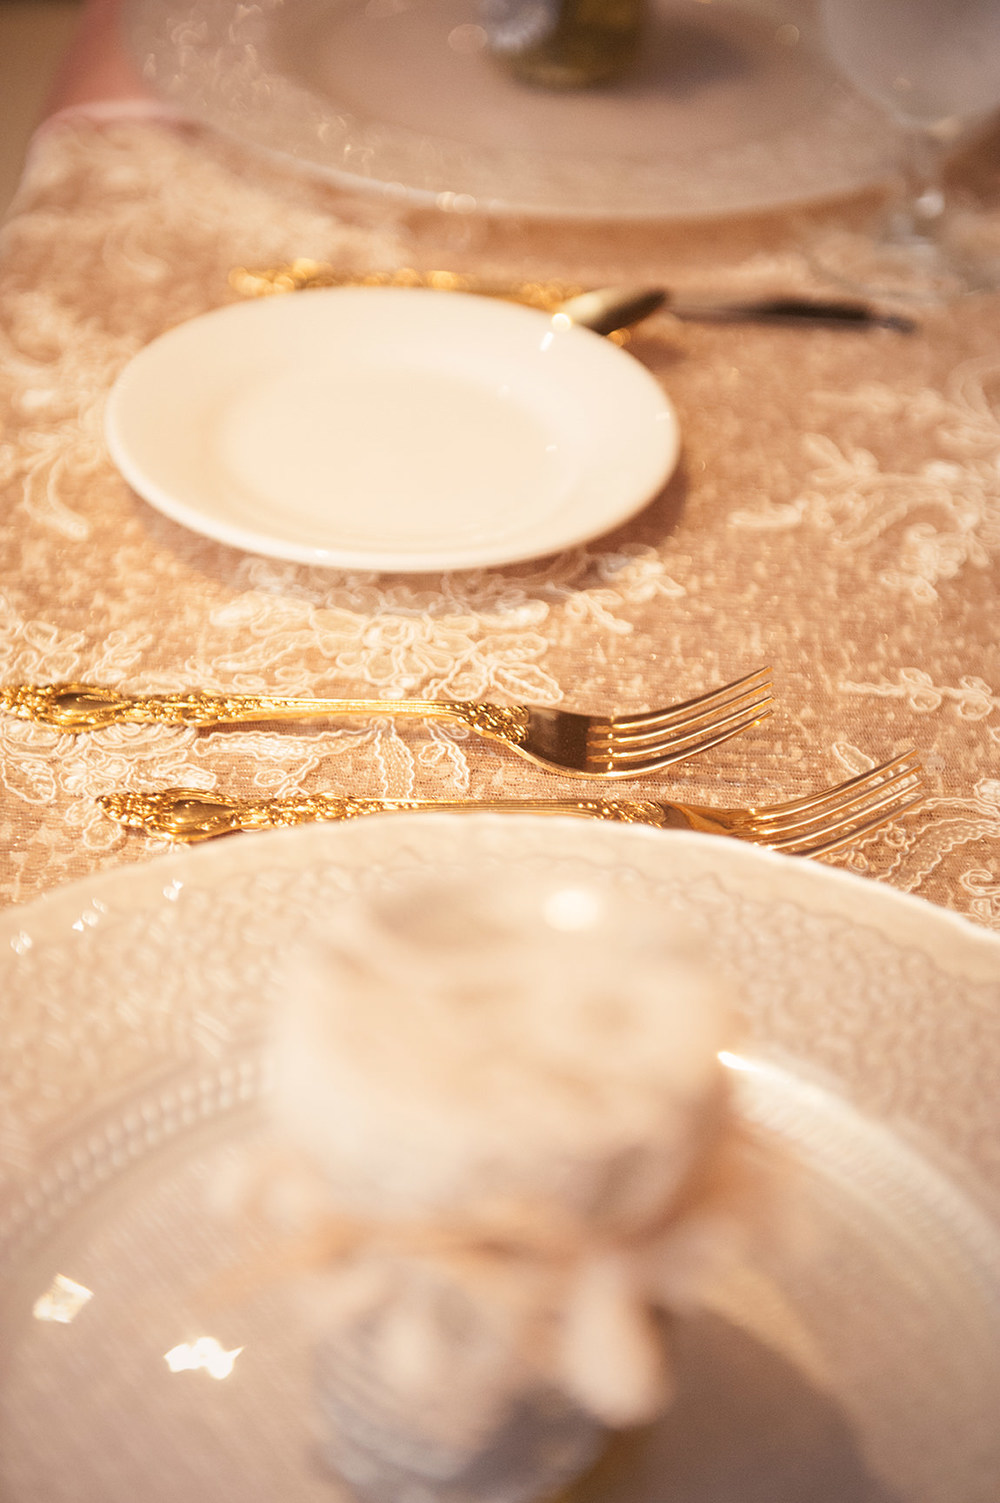 St-Catharines-Wedding-Stone-Mill-Inn-Amy-Darryl-photography-by-Morgan-Falk-069.JPG